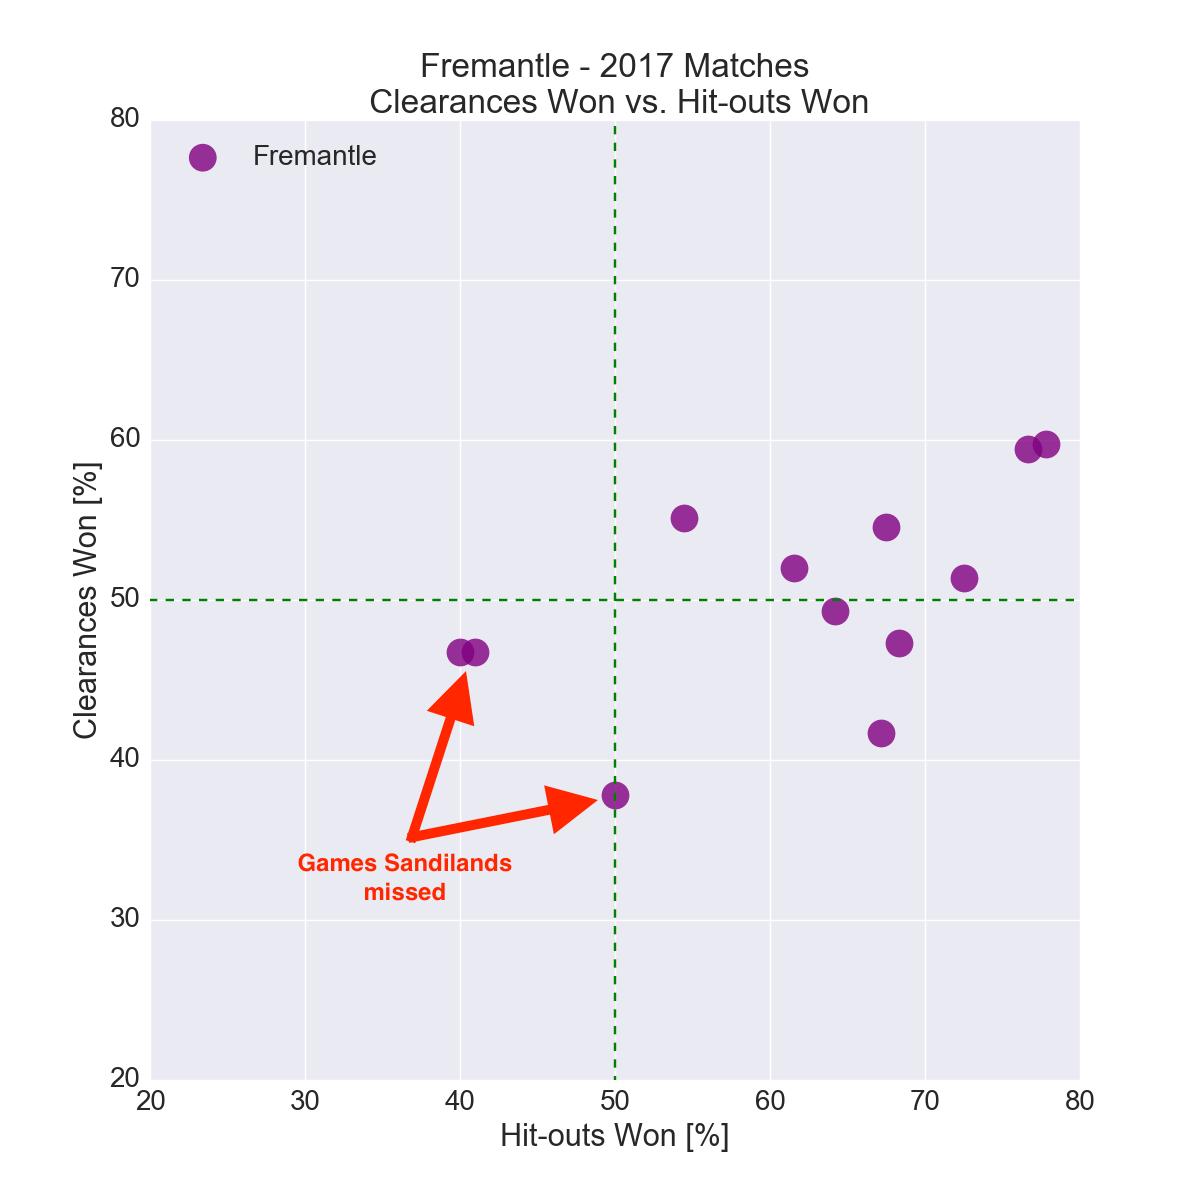 Figure-1: Fremantle in 2017 – Clearances Won vs. Hit-outs Won